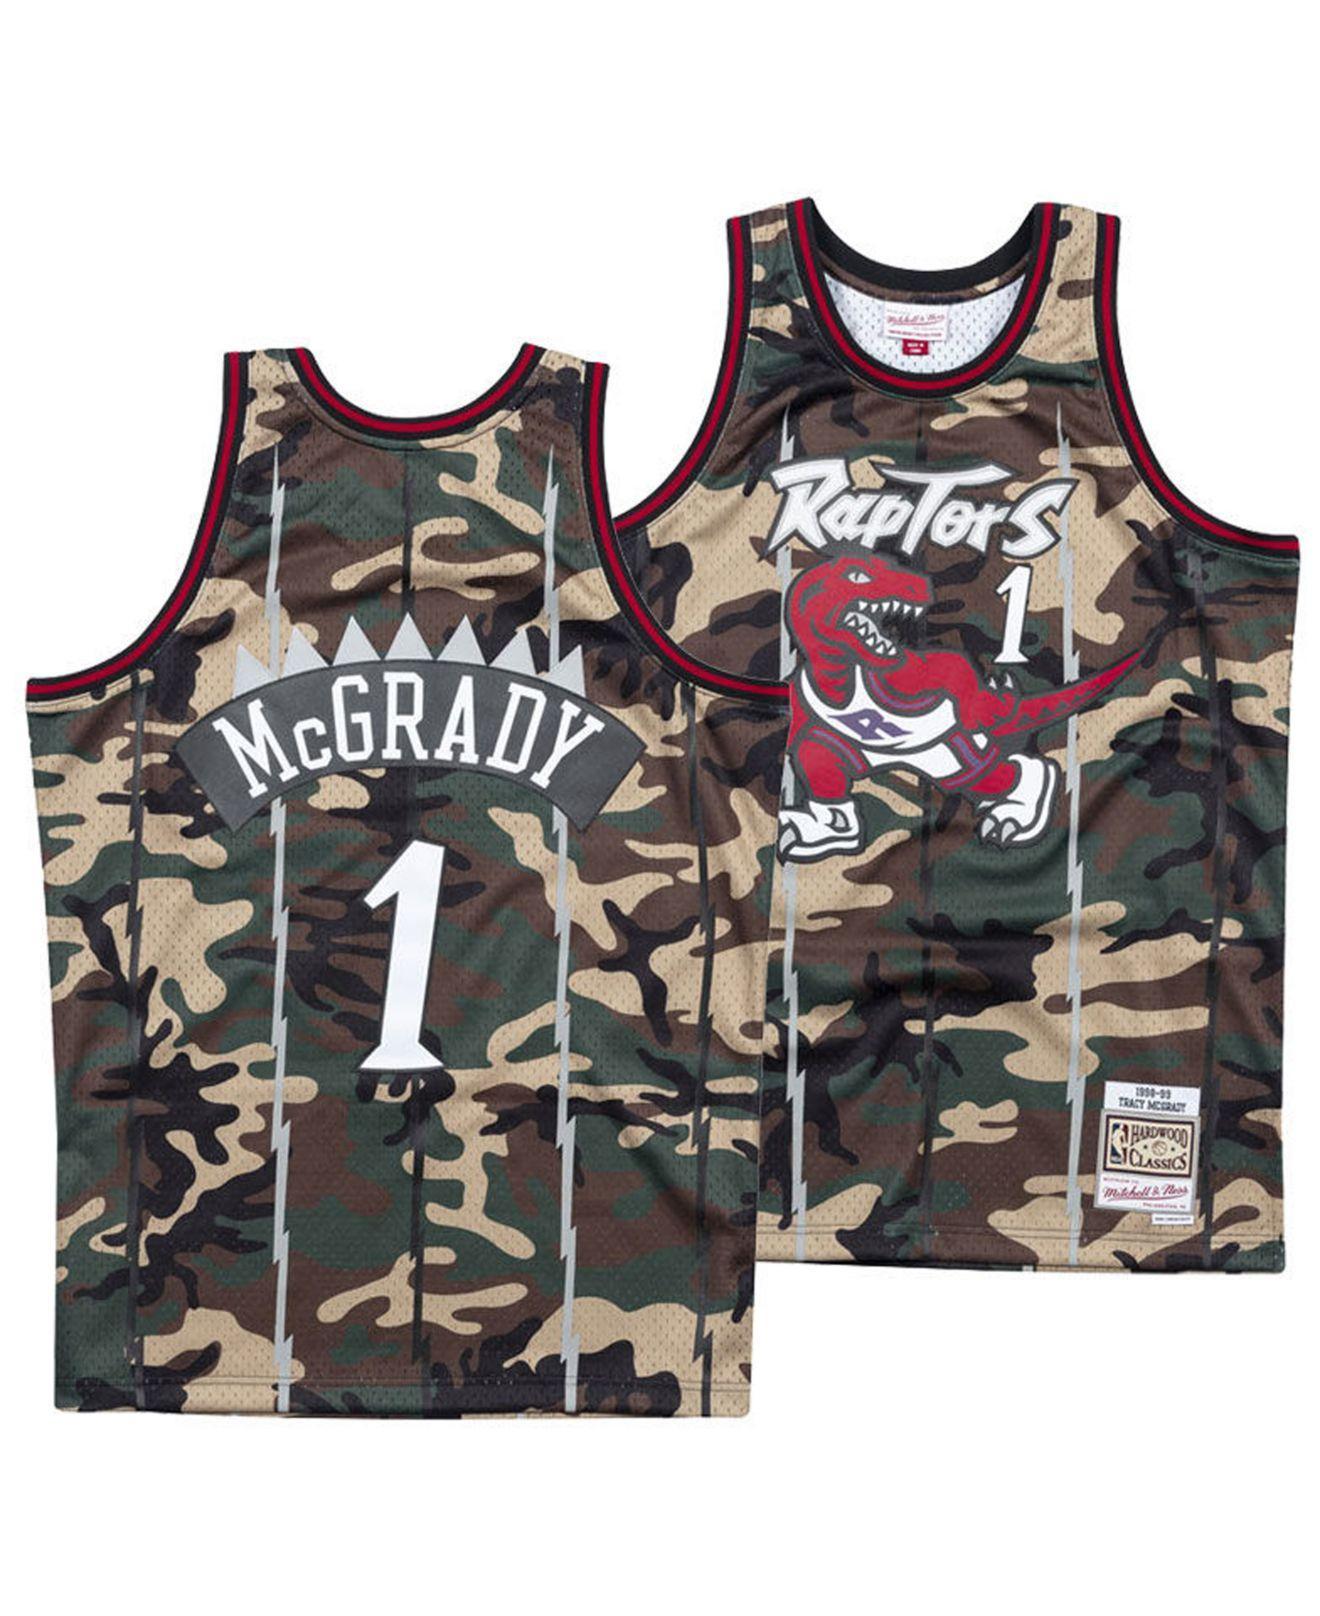 75eef2b6098 Mitchell   Ness - Multicolor Tracy Mcgrady Toronto Raptors Woodland Camo  Swingman Jersey for Men -. View fullscreen